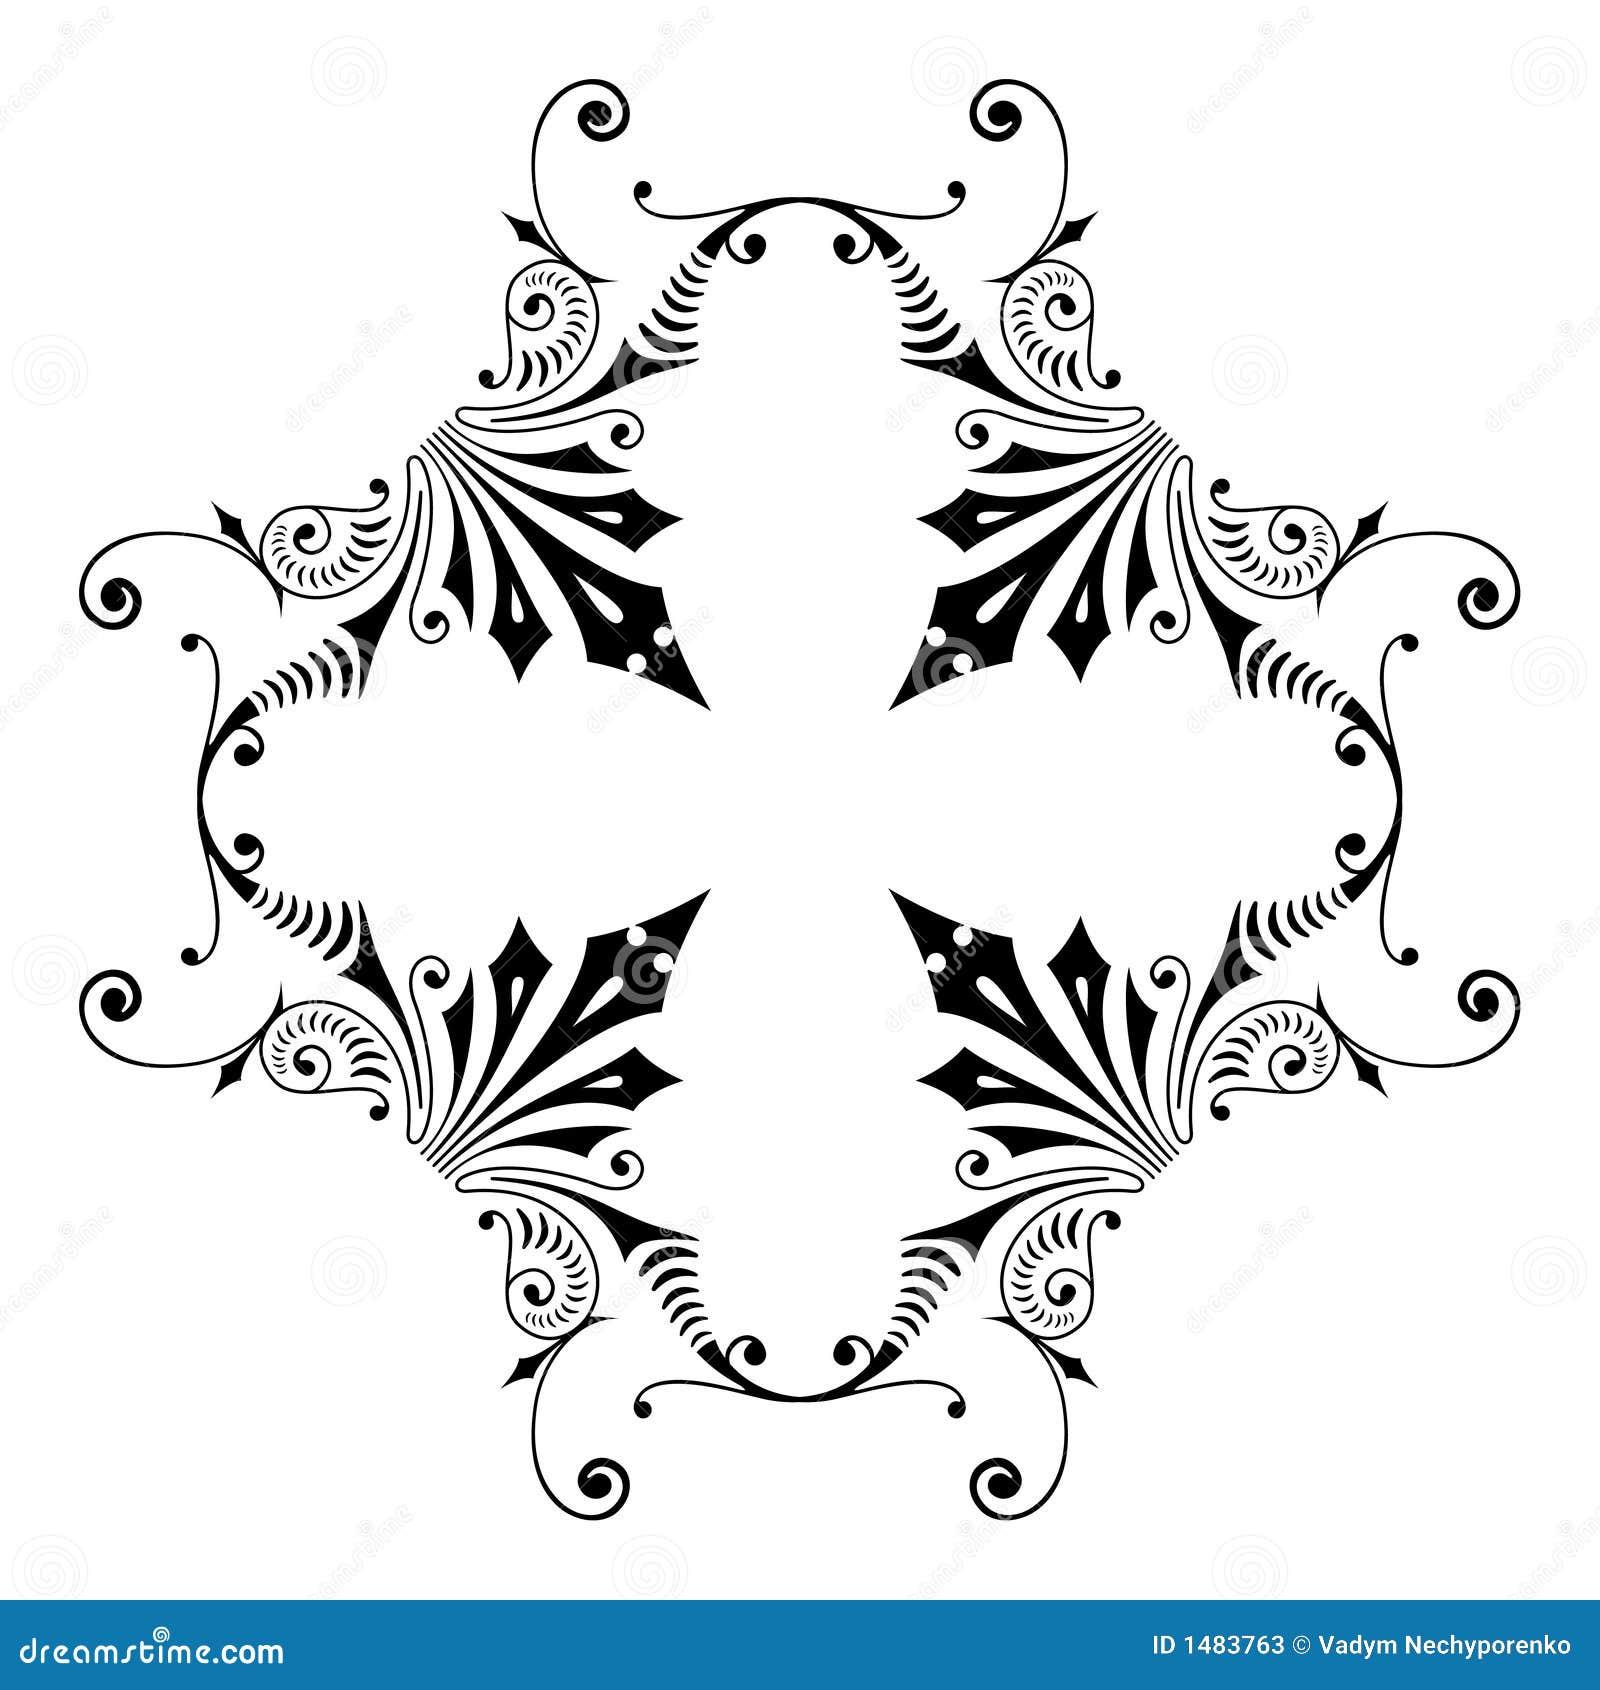 Symmetry In Design symmetrical design - home design